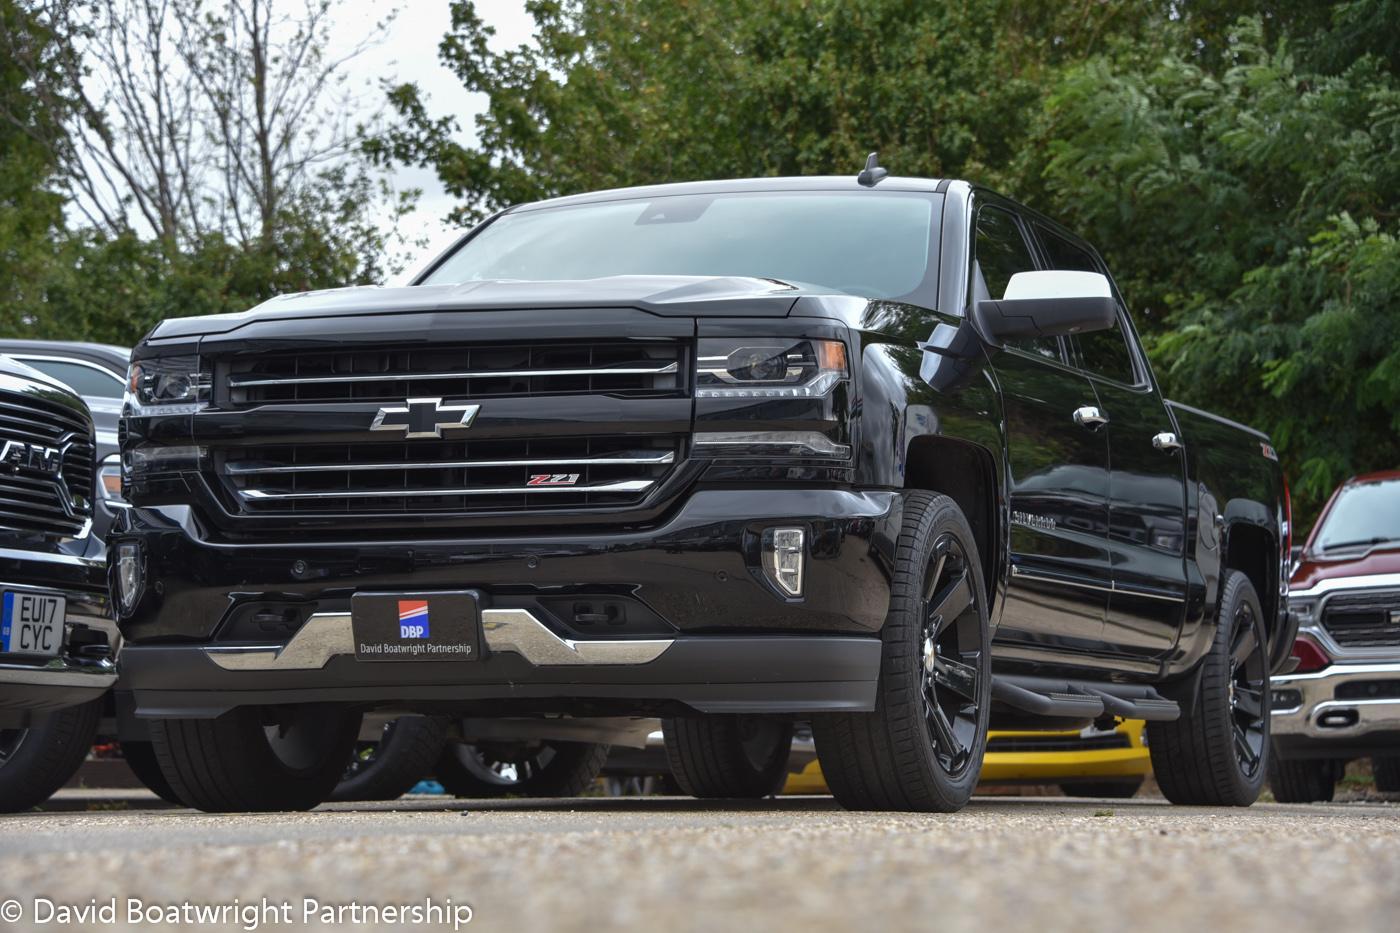 2016 Chevrolet Silverado Ltz David Boatwright